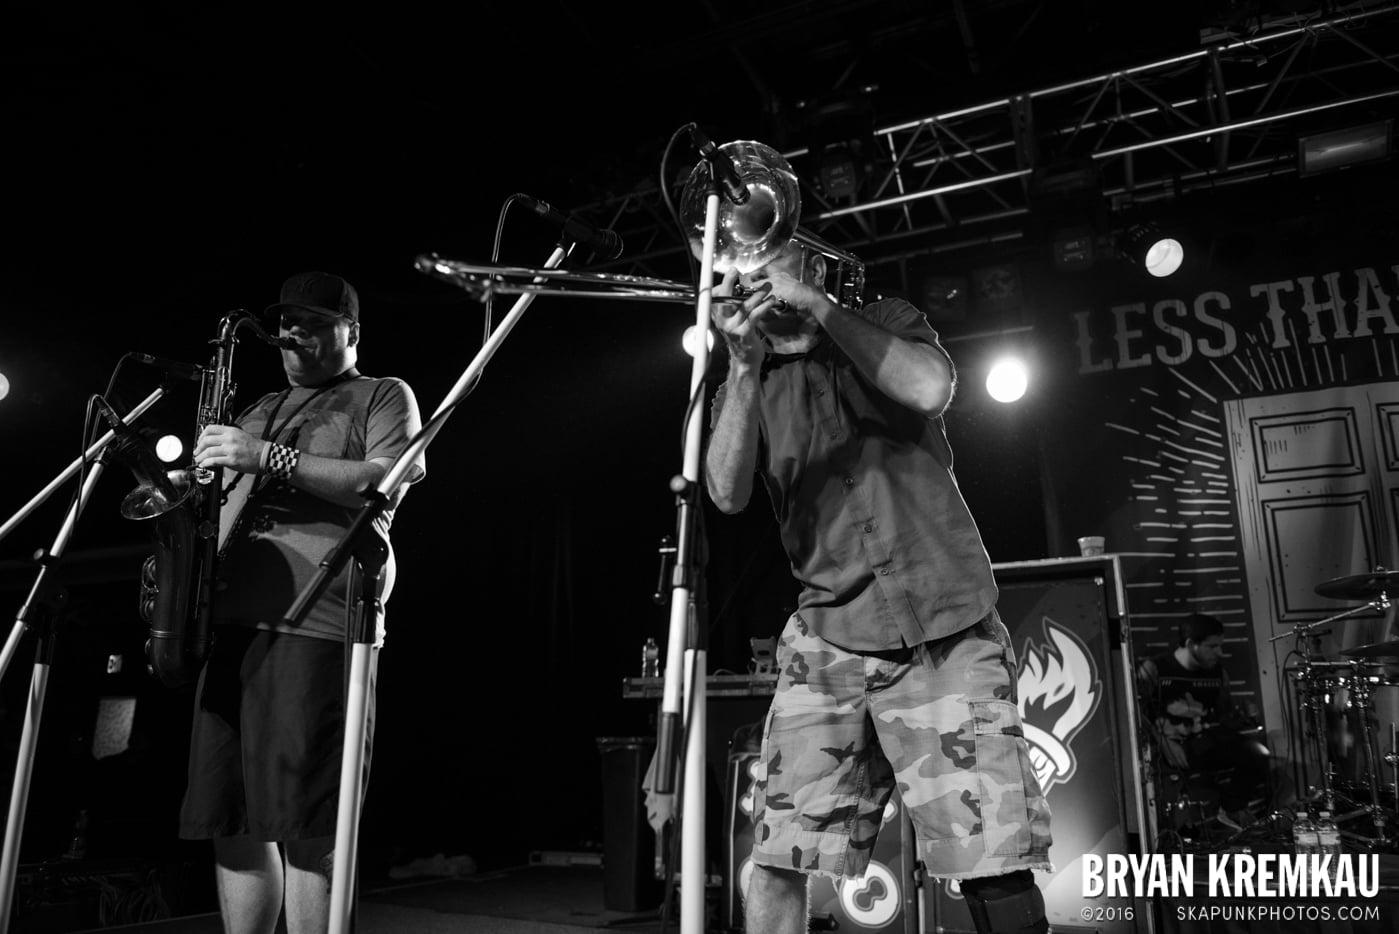 Less Than Jake @ Starland Ballroom, Sayreville, NJ - 11.9.13 (1)